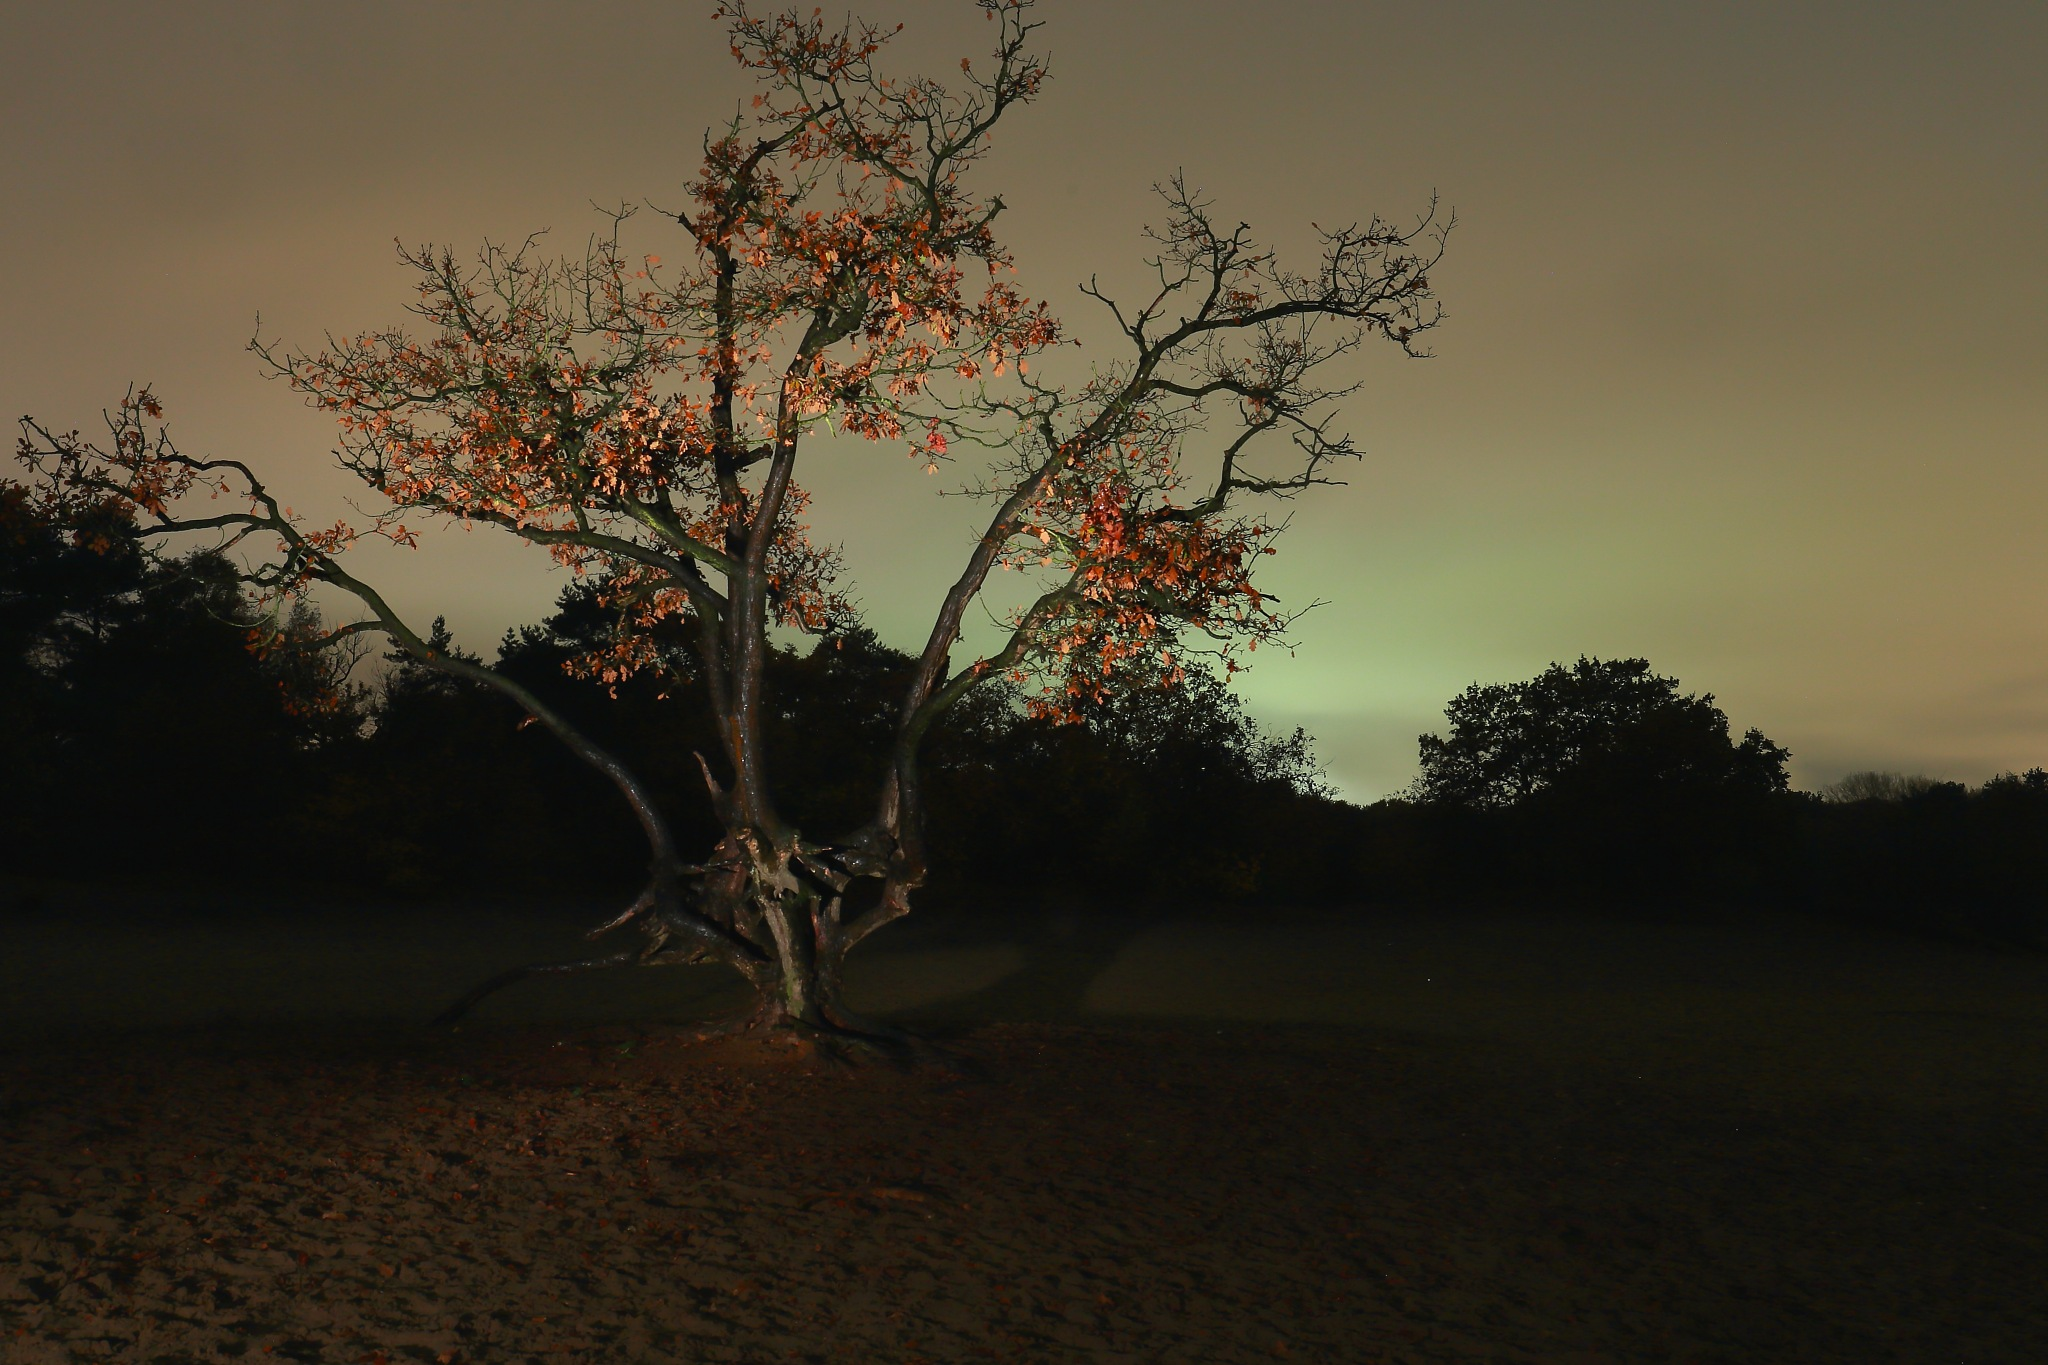 Nachtfotografie by agwstroop